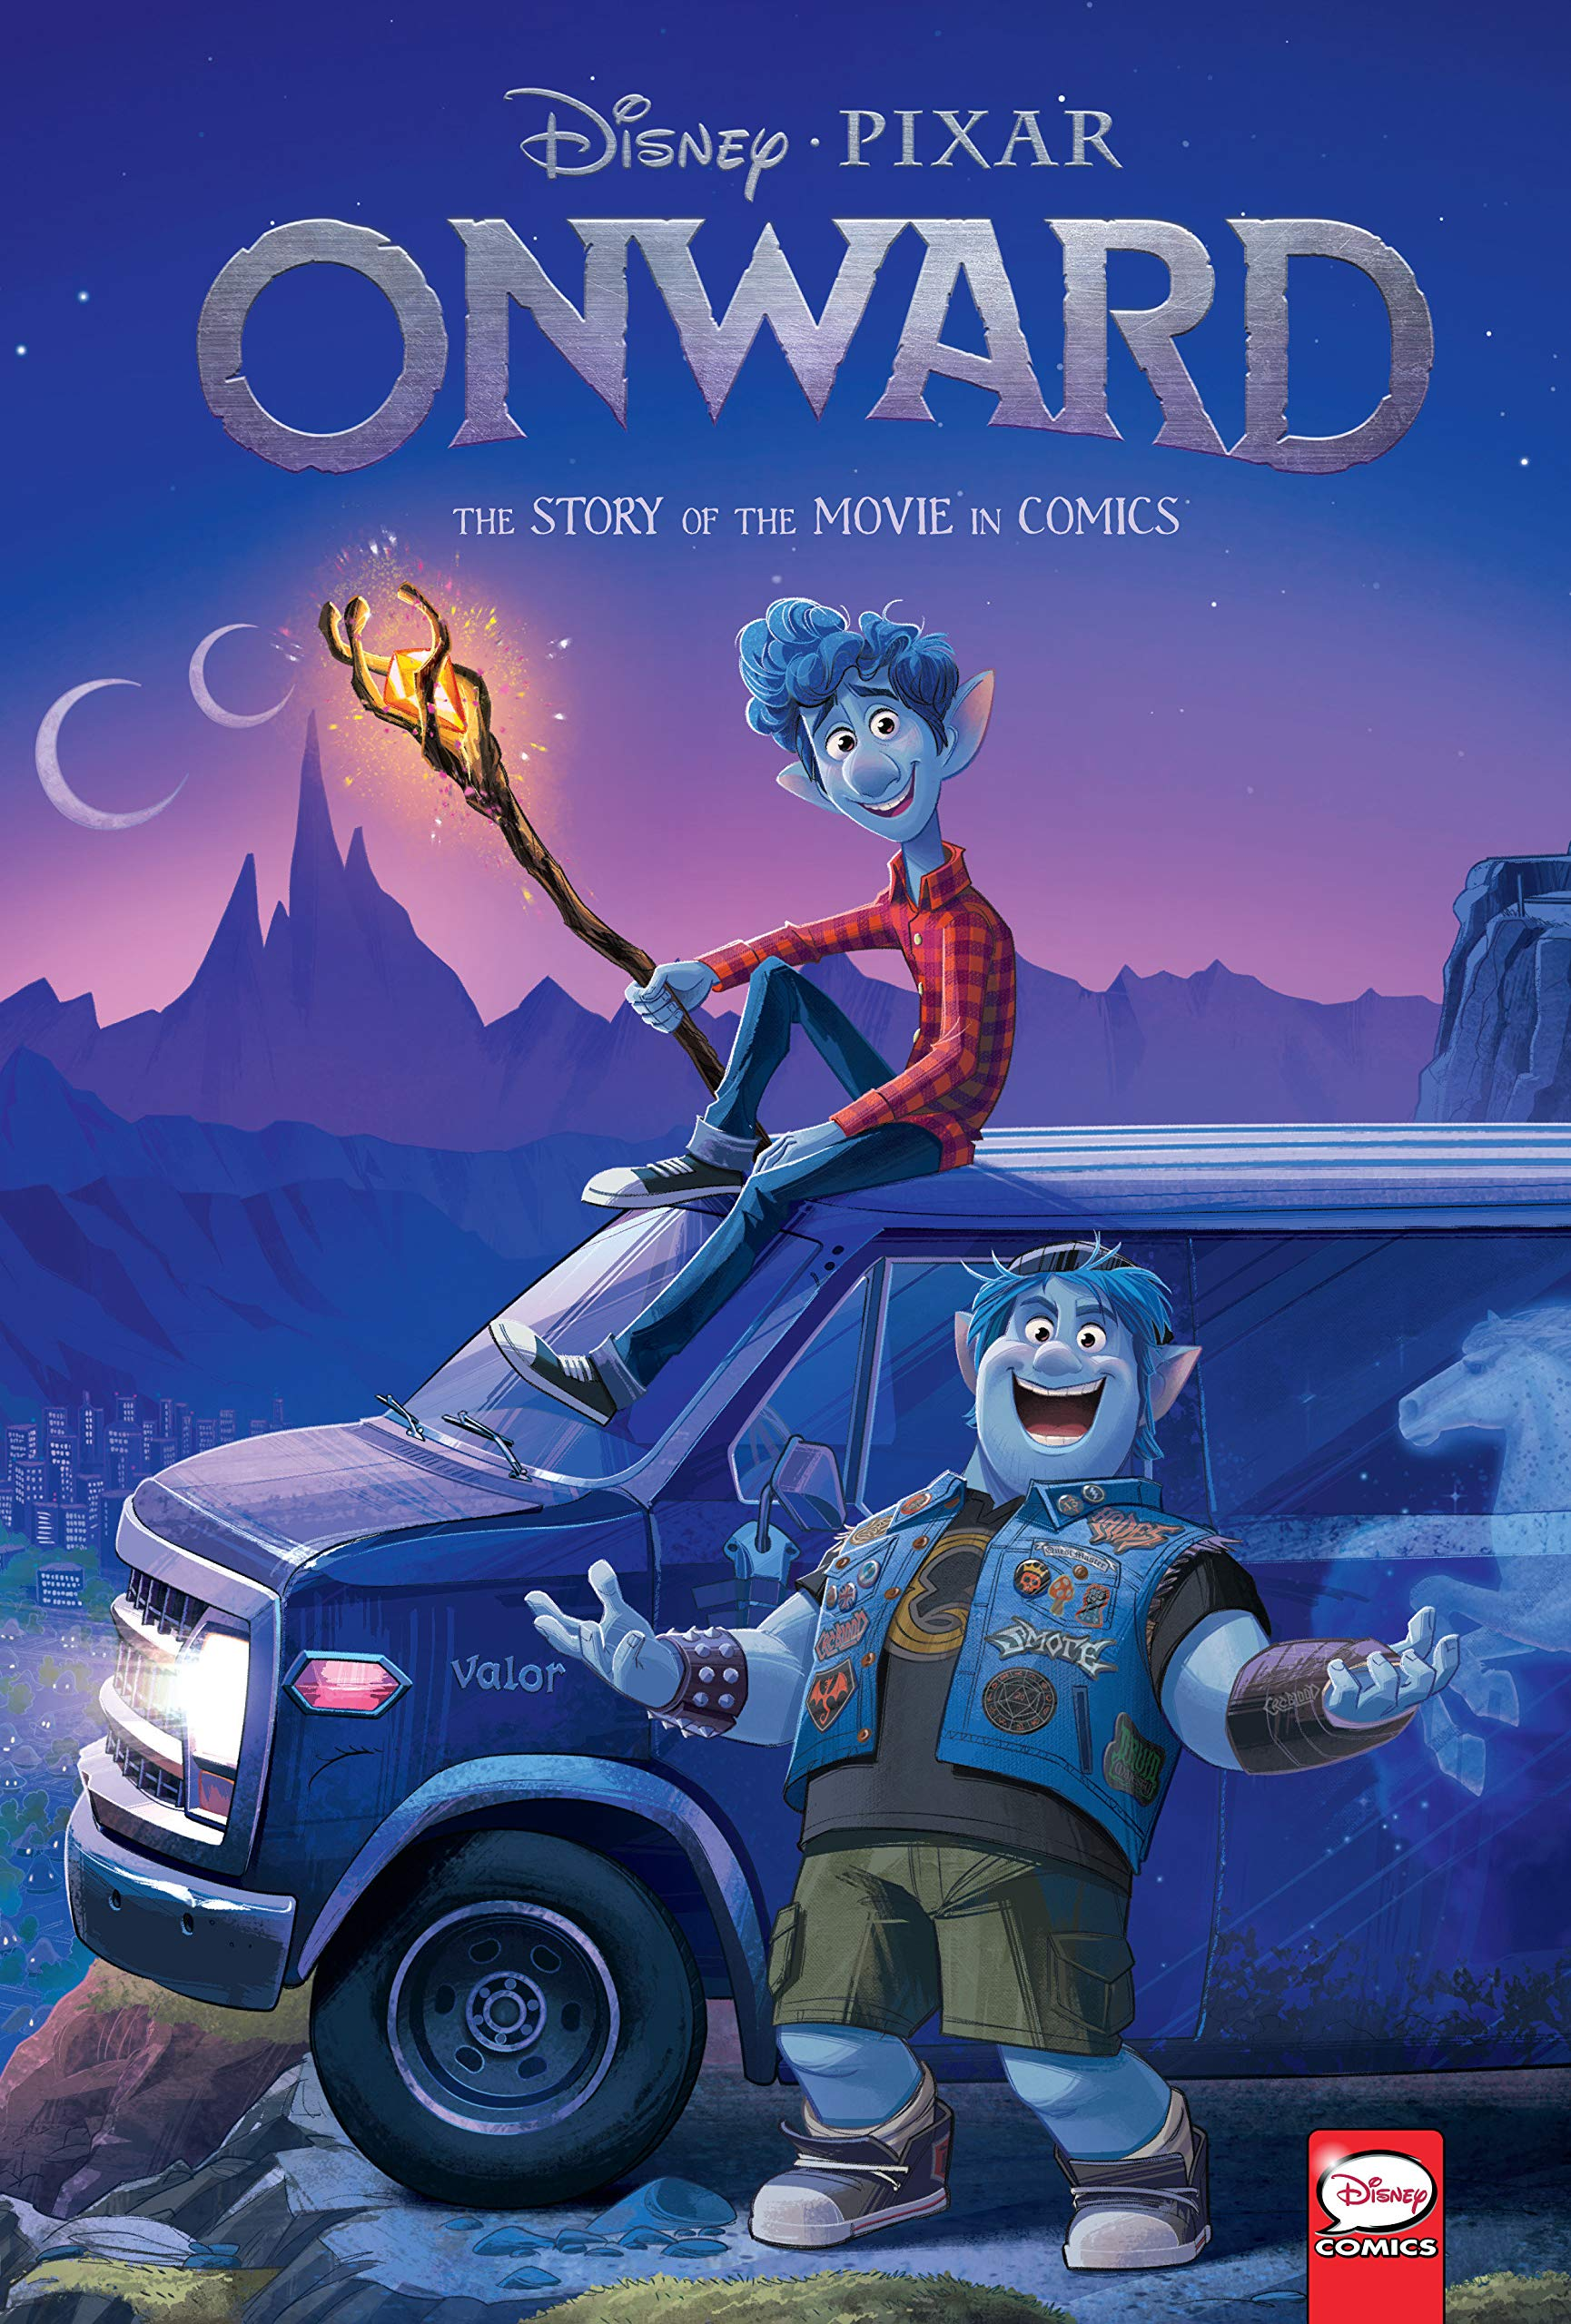 Disney/PIXAR Onward: The Story of the Movie in Comics: Amazon.ca: Disney:  Books